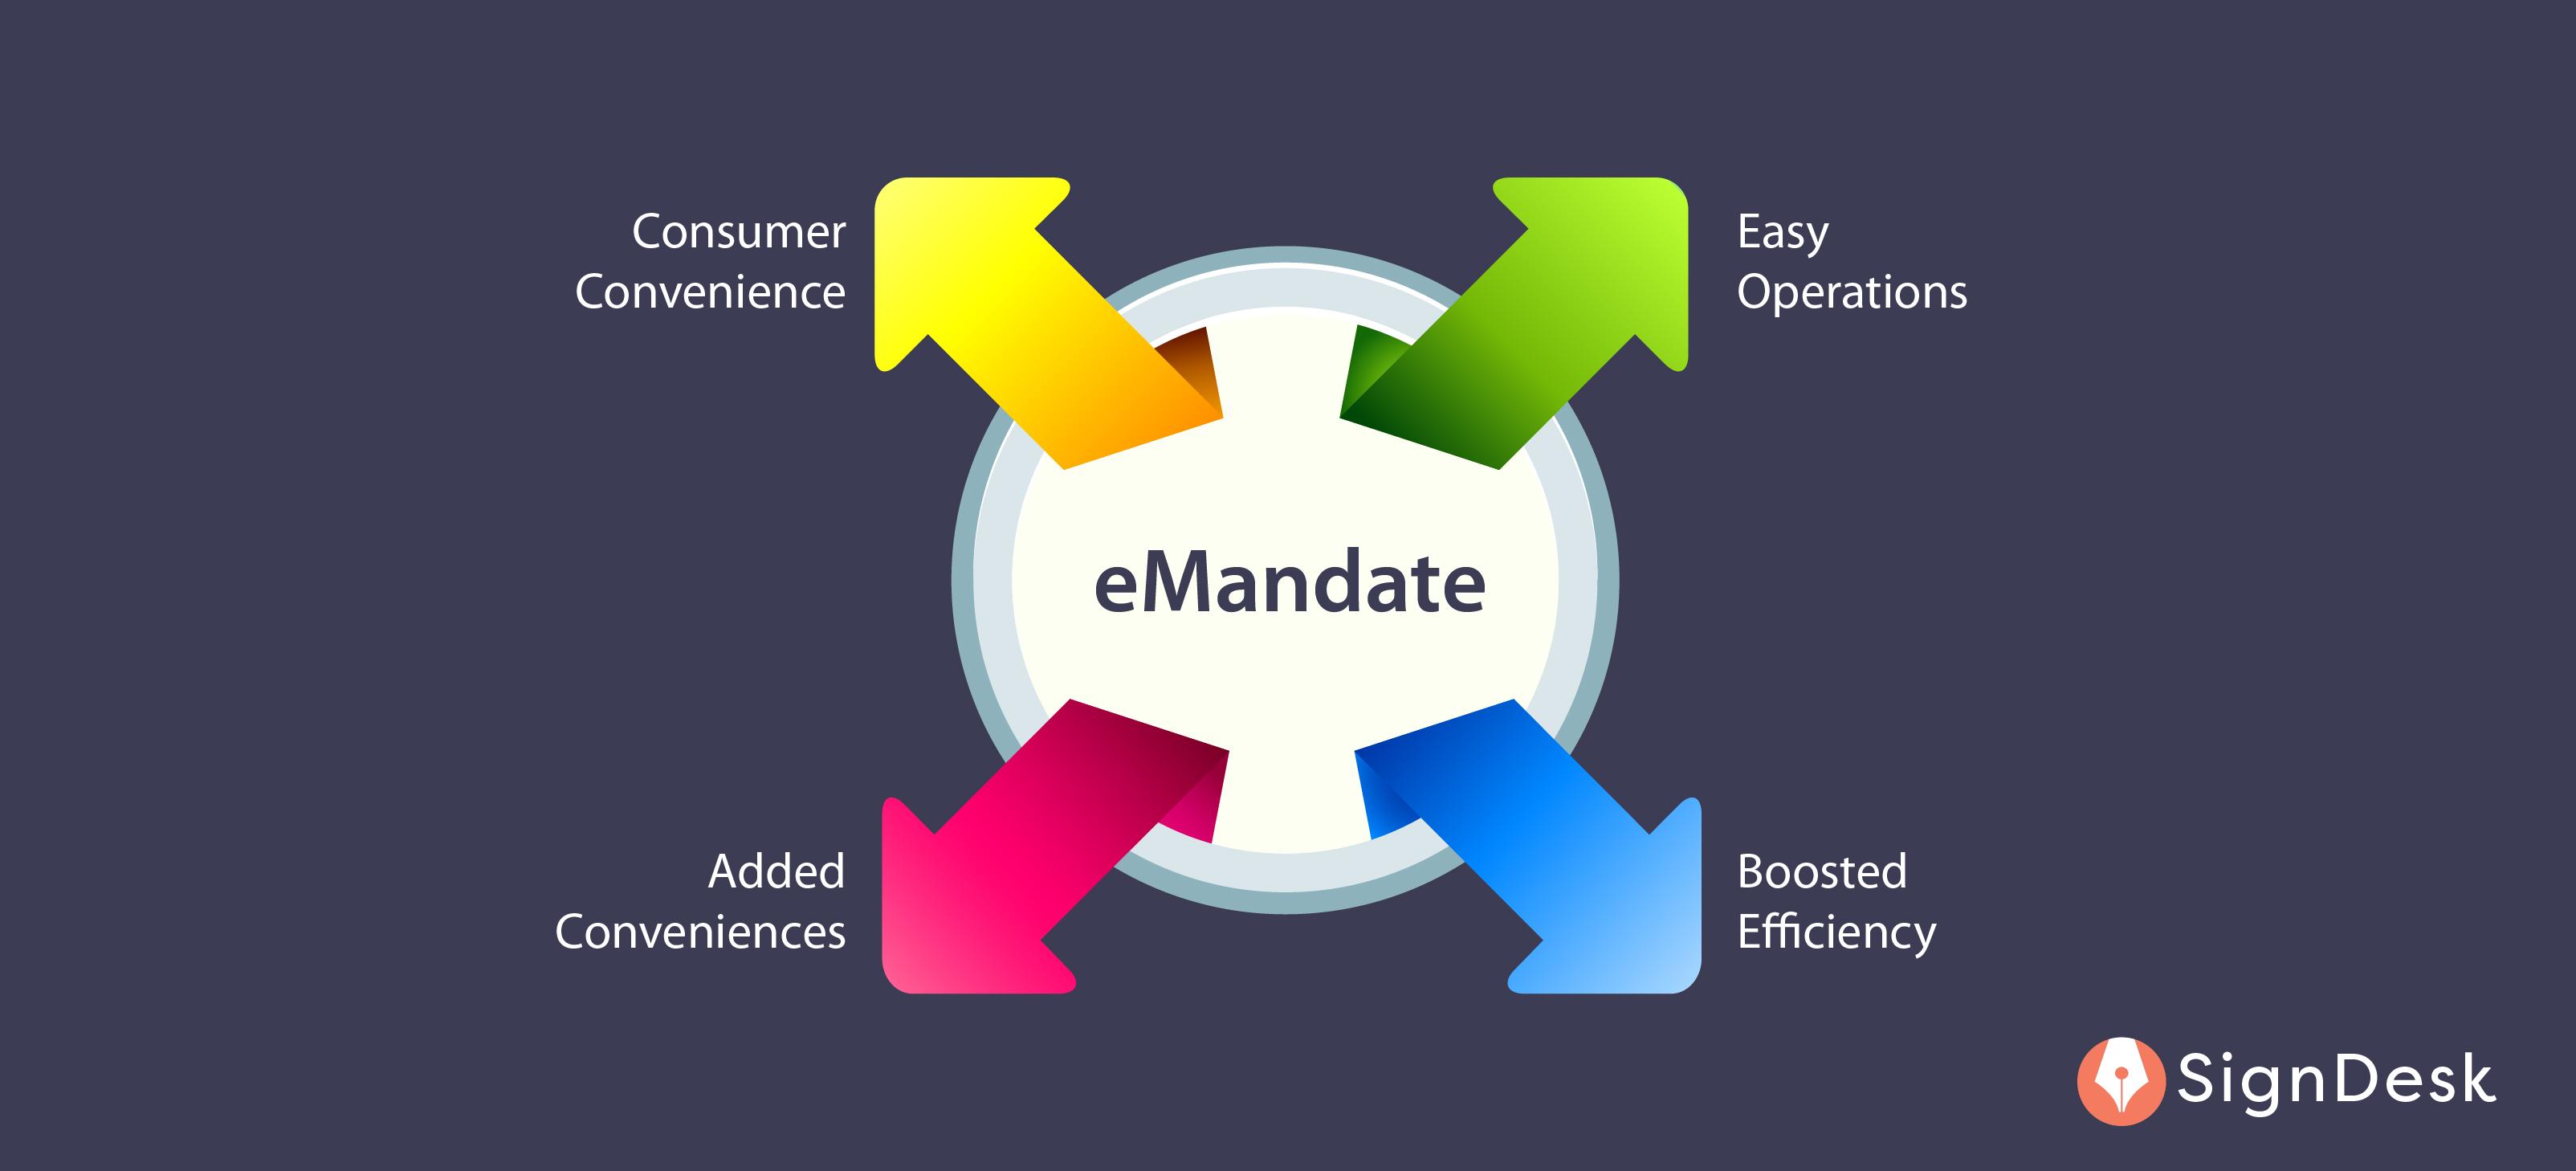 Advantages of eMandate